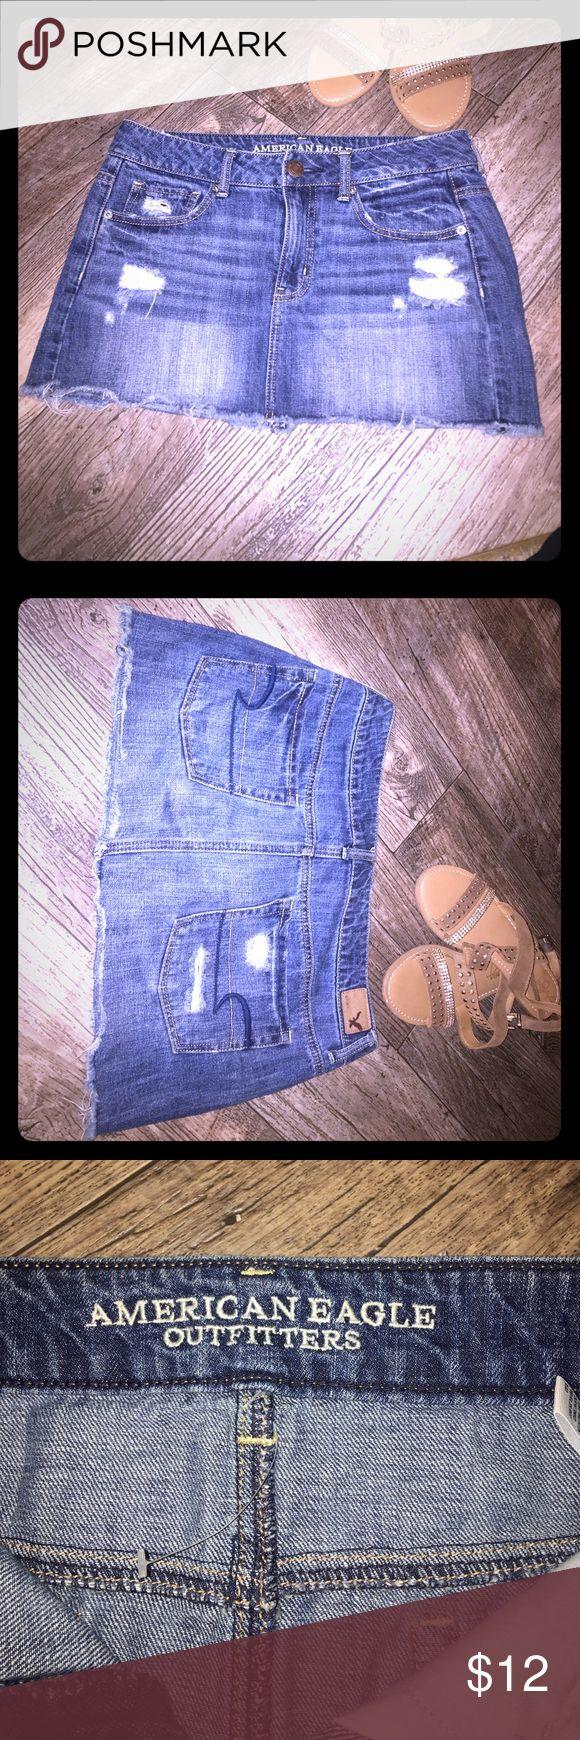 American Eagle jean mini skirt - Makes an offer!! American Eagle jean mini shirt -- Must Go! Make me an offer!! American Eagle Outfitters Skirts Mini